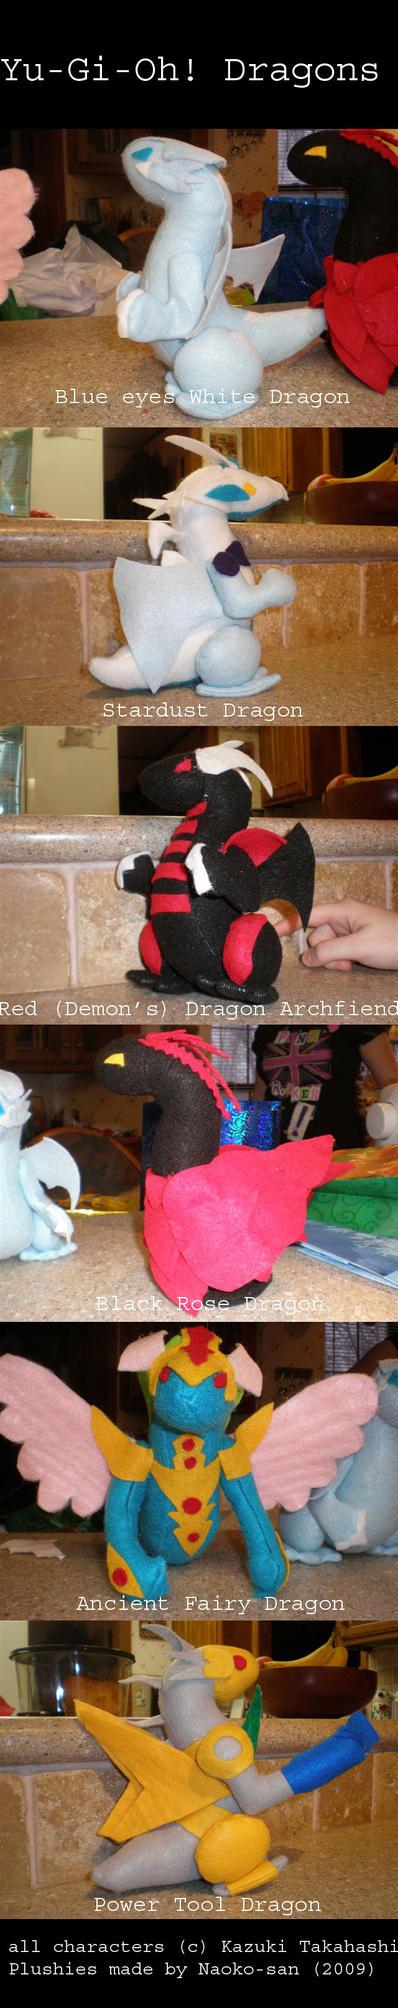 Yu-Gi-Oh Dragon Plushies by Darling-Poe